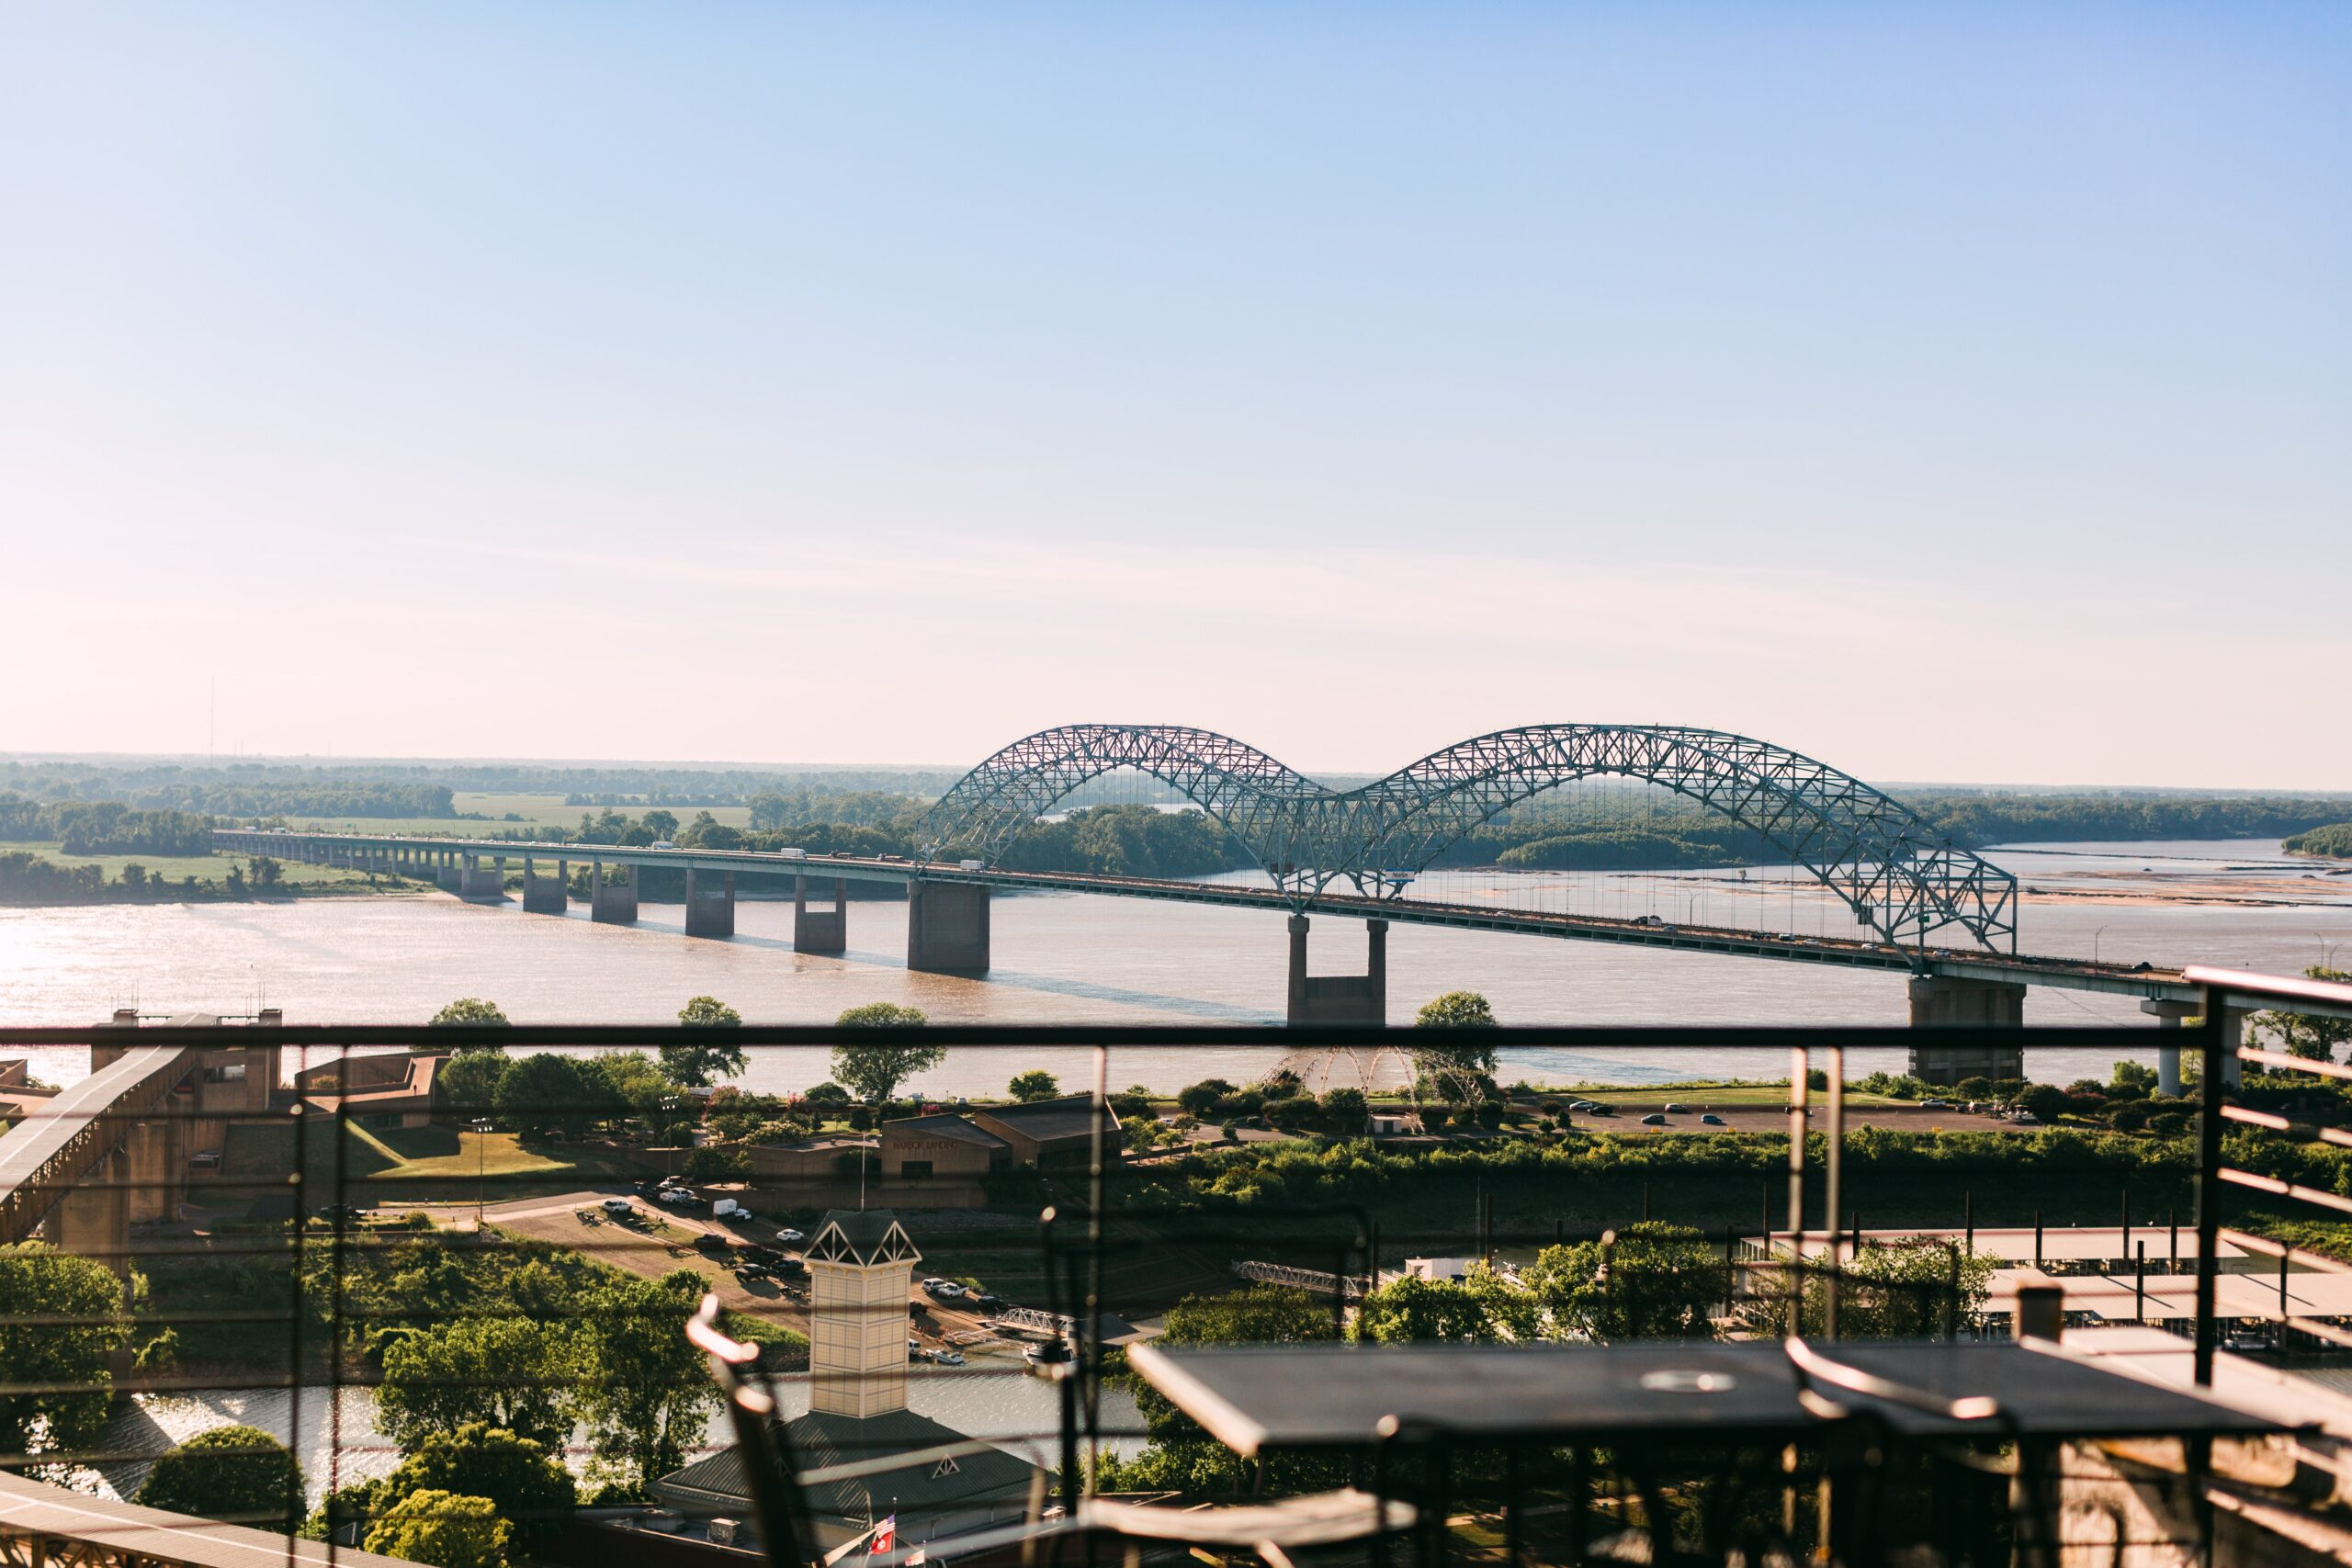 Memphis bridge over a river